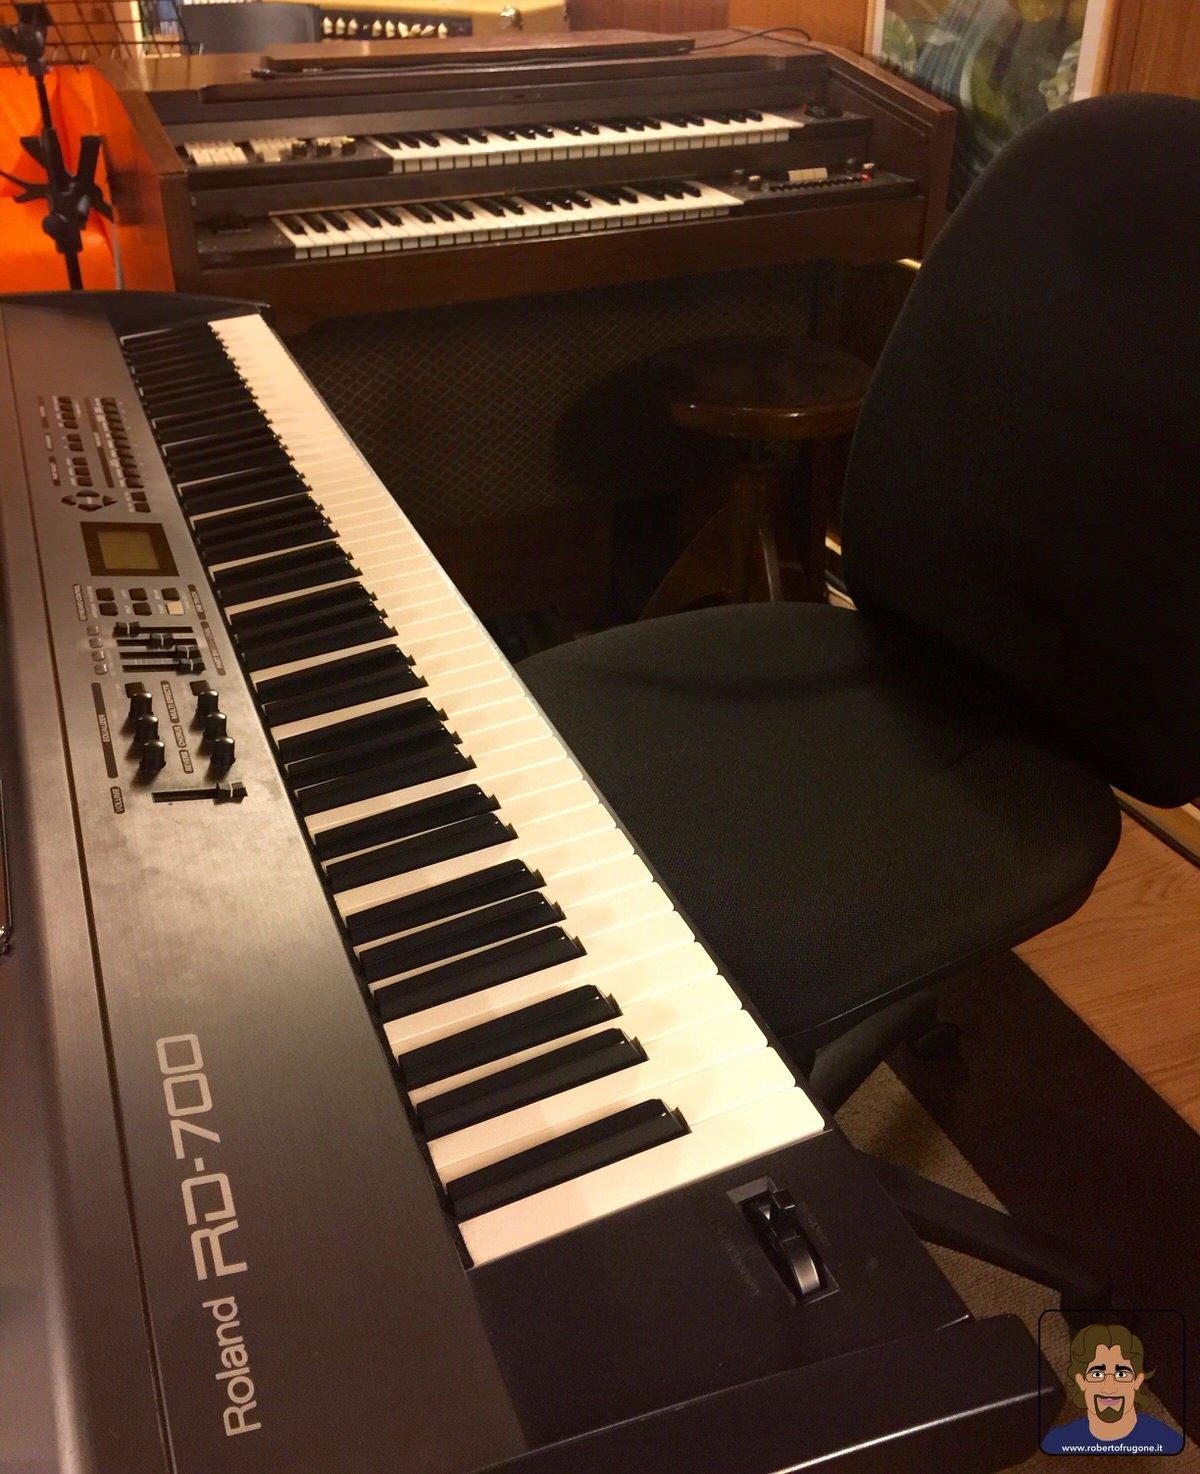 Totem Studio Sala Prove Musicali Casarza Ligure Roland RD700 e organo hammond Farfisa